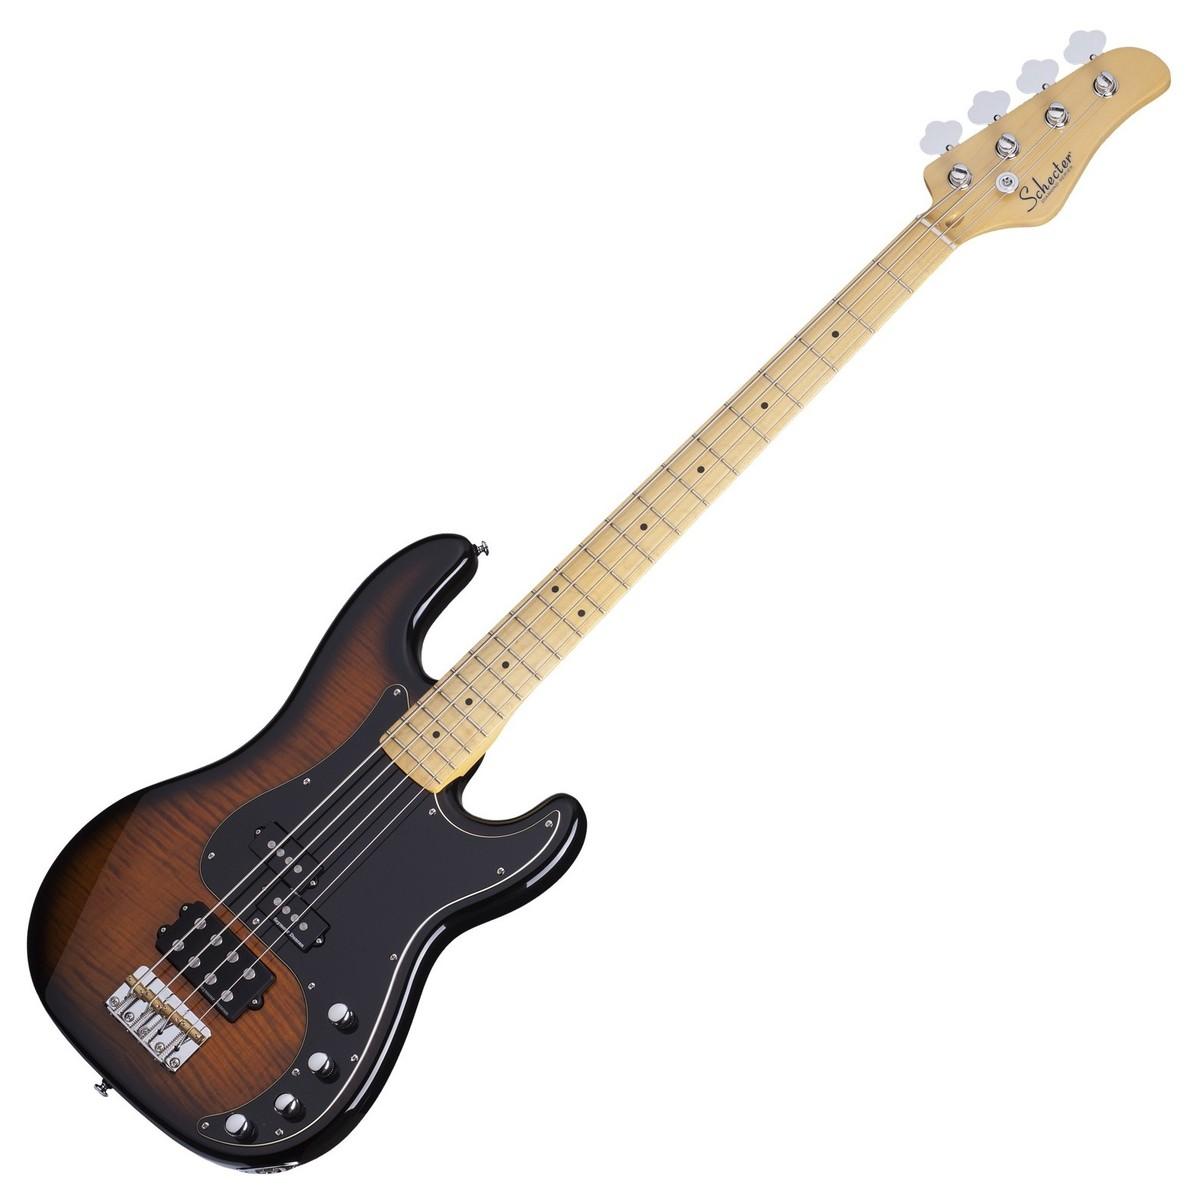 Schecter diamond p plus bass guitar dark vintage sunburst for Guitar domont